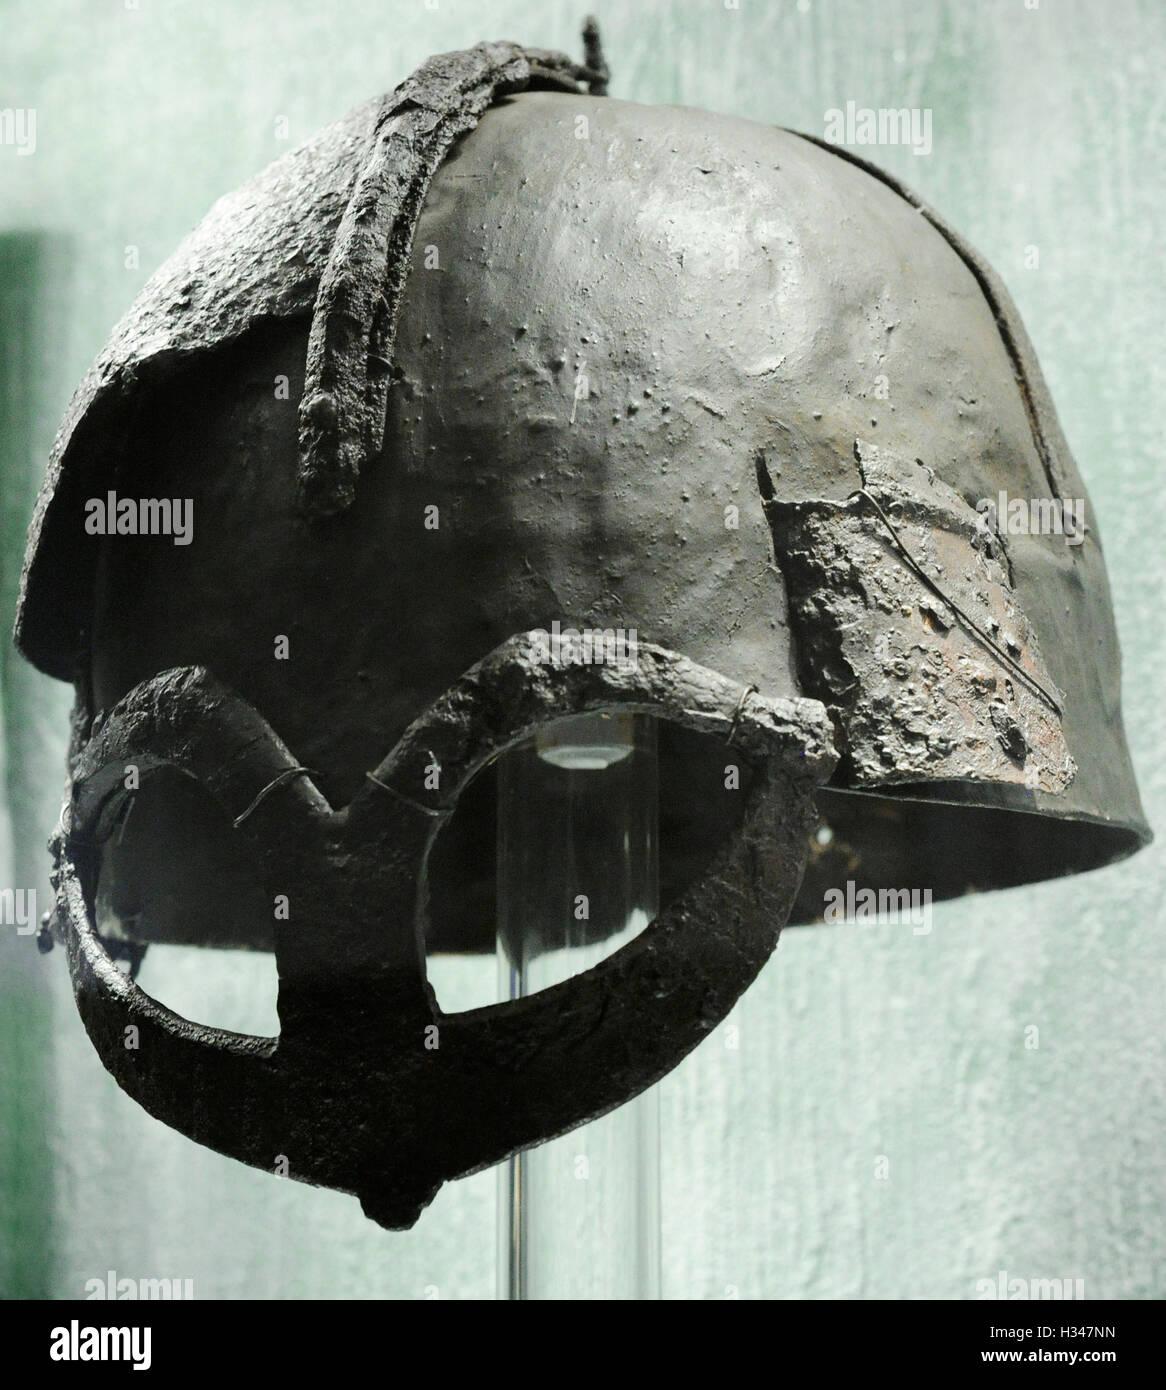 Scandinavia. Viking Age. helmet from chieftain's grave. Iron. Gjermundbu in Ringerike, Eastern Norway. 10th century. Stock Photo